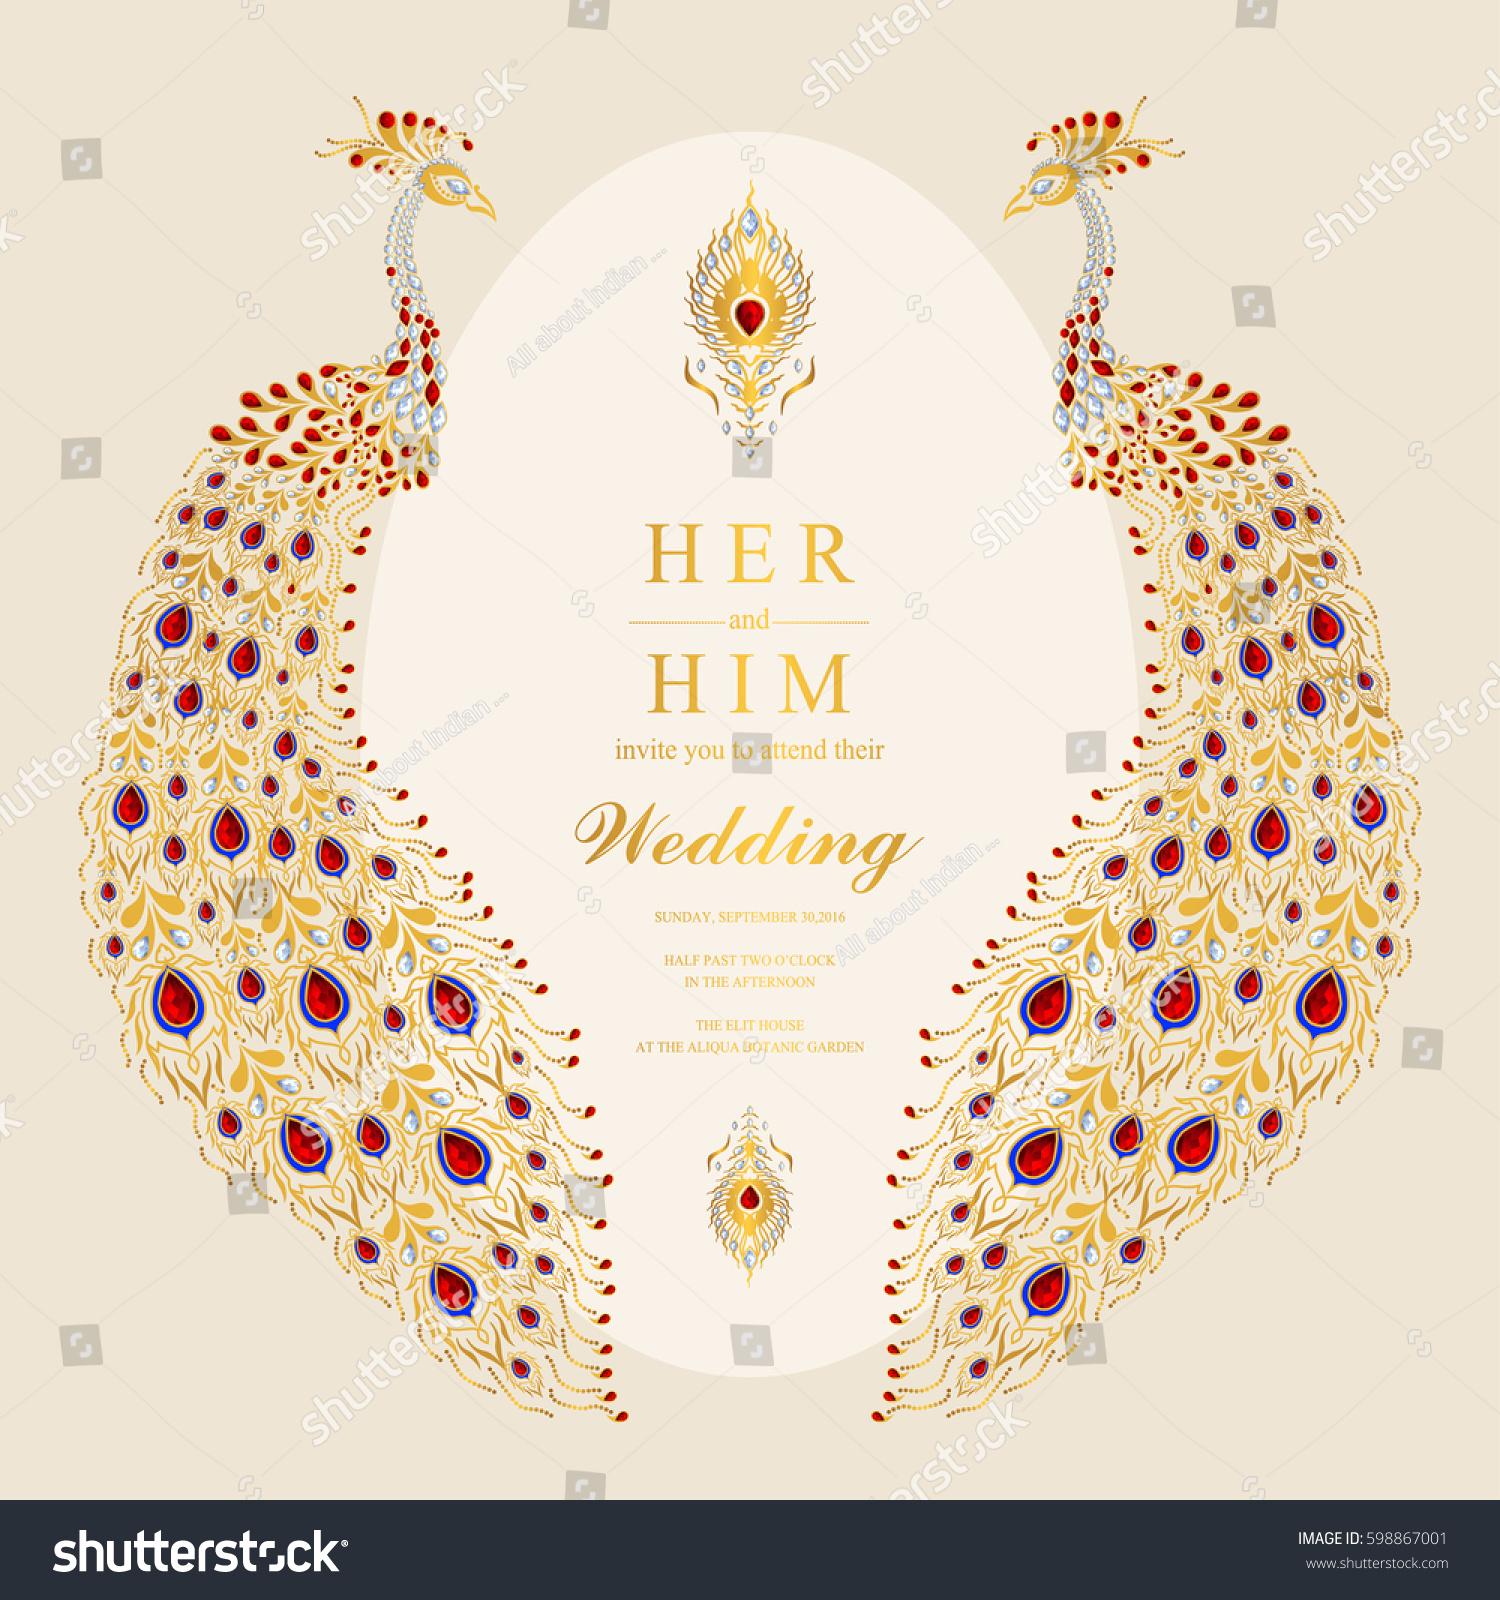 Indian Wedding Invitation Card Templates Gold Stock Vector 598867001 ...